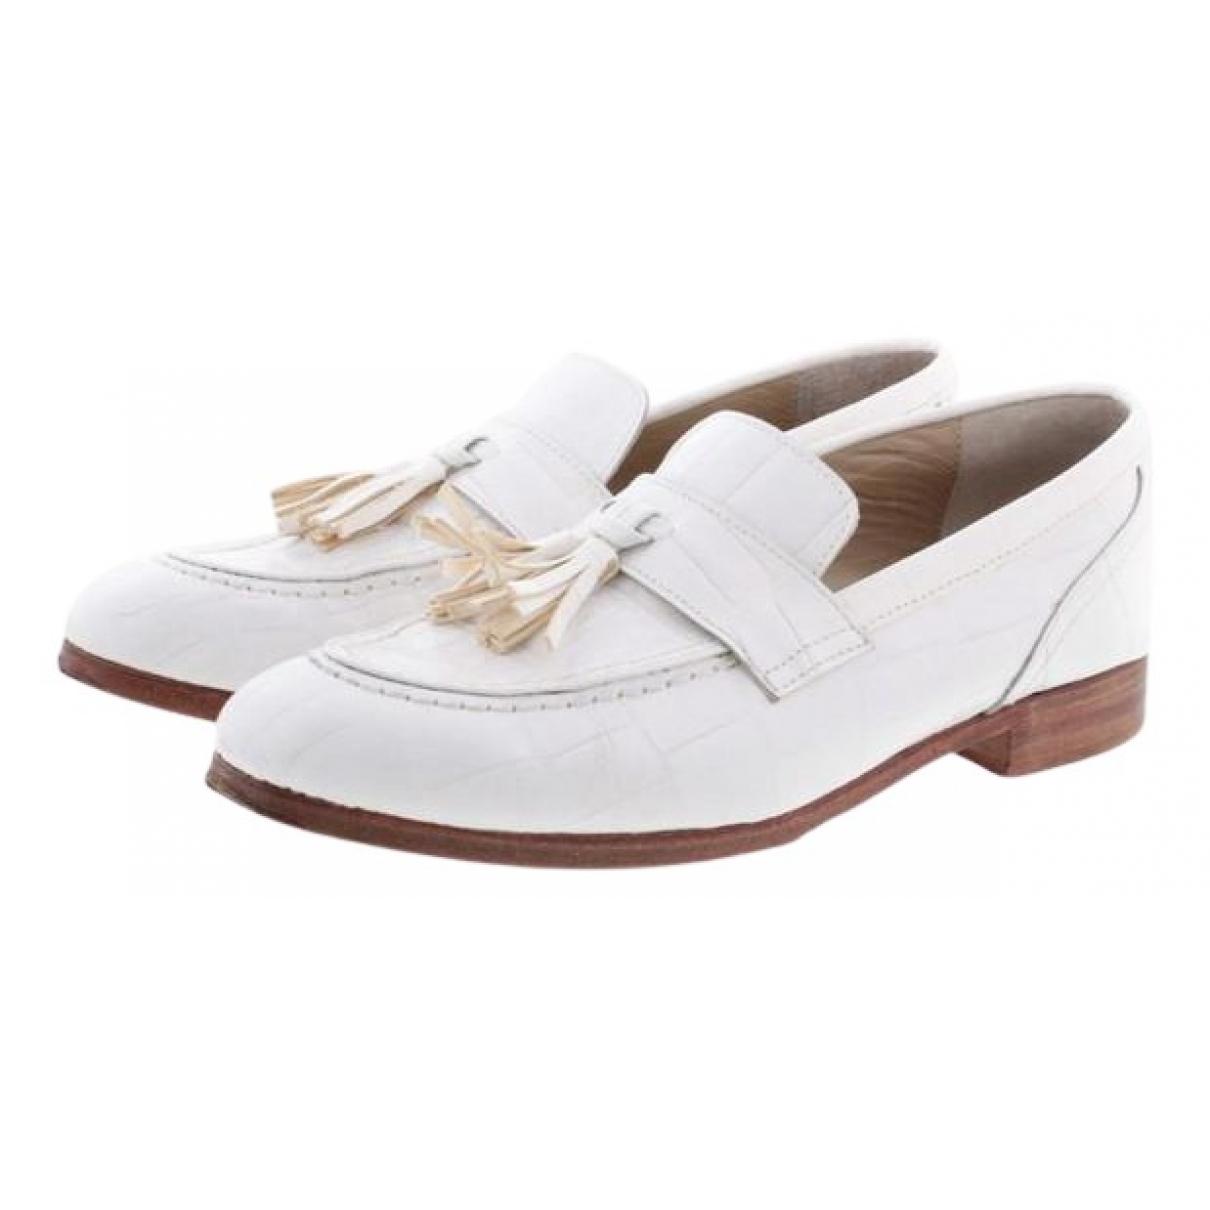 Comme Des Garcons N White Leather Lace ups for Women 38 EU